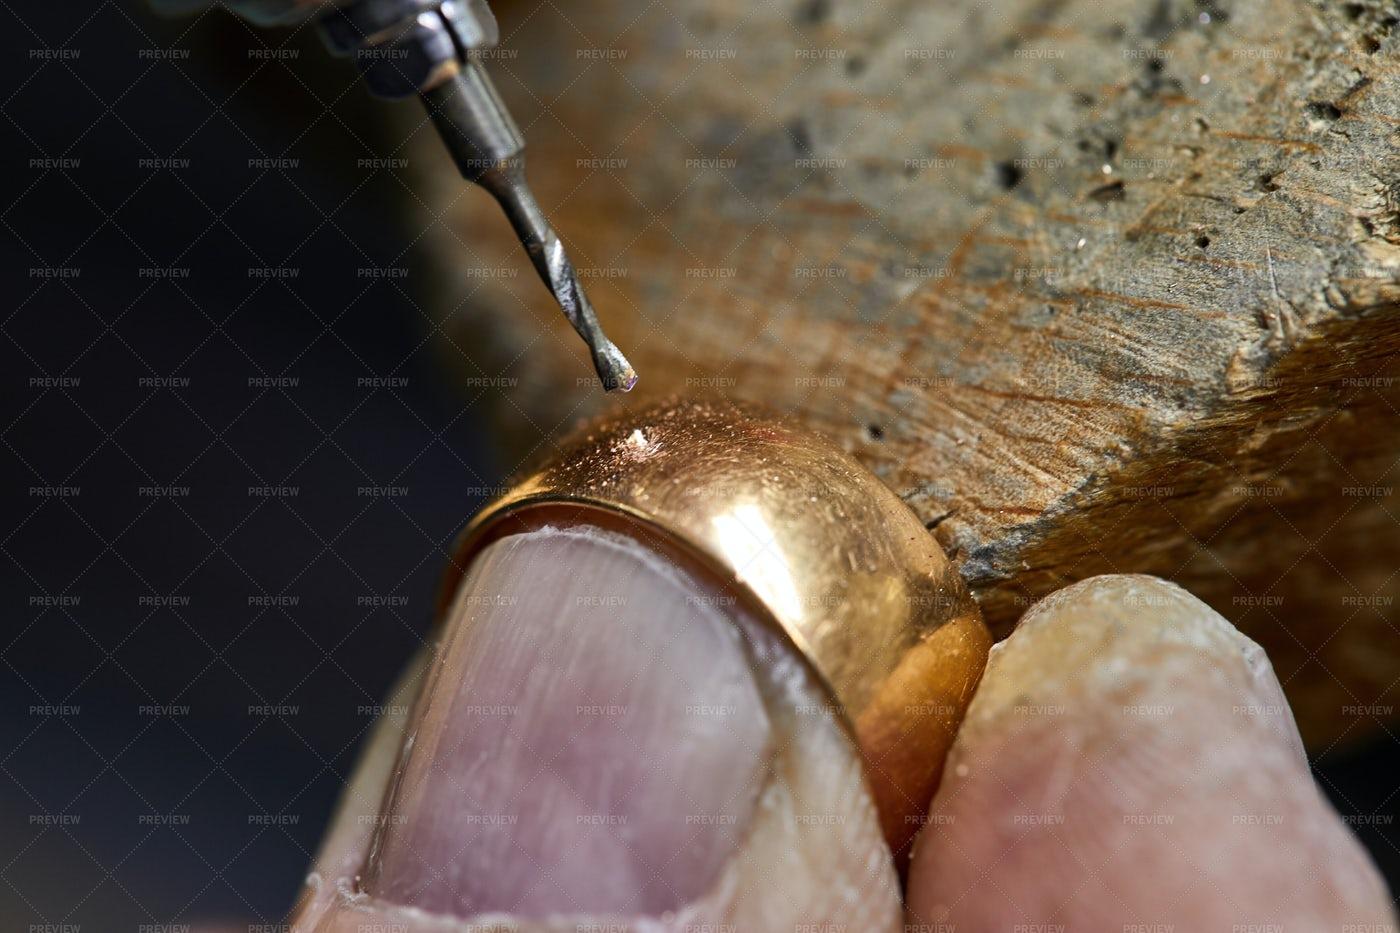 Jewelry Production: Stock Photos